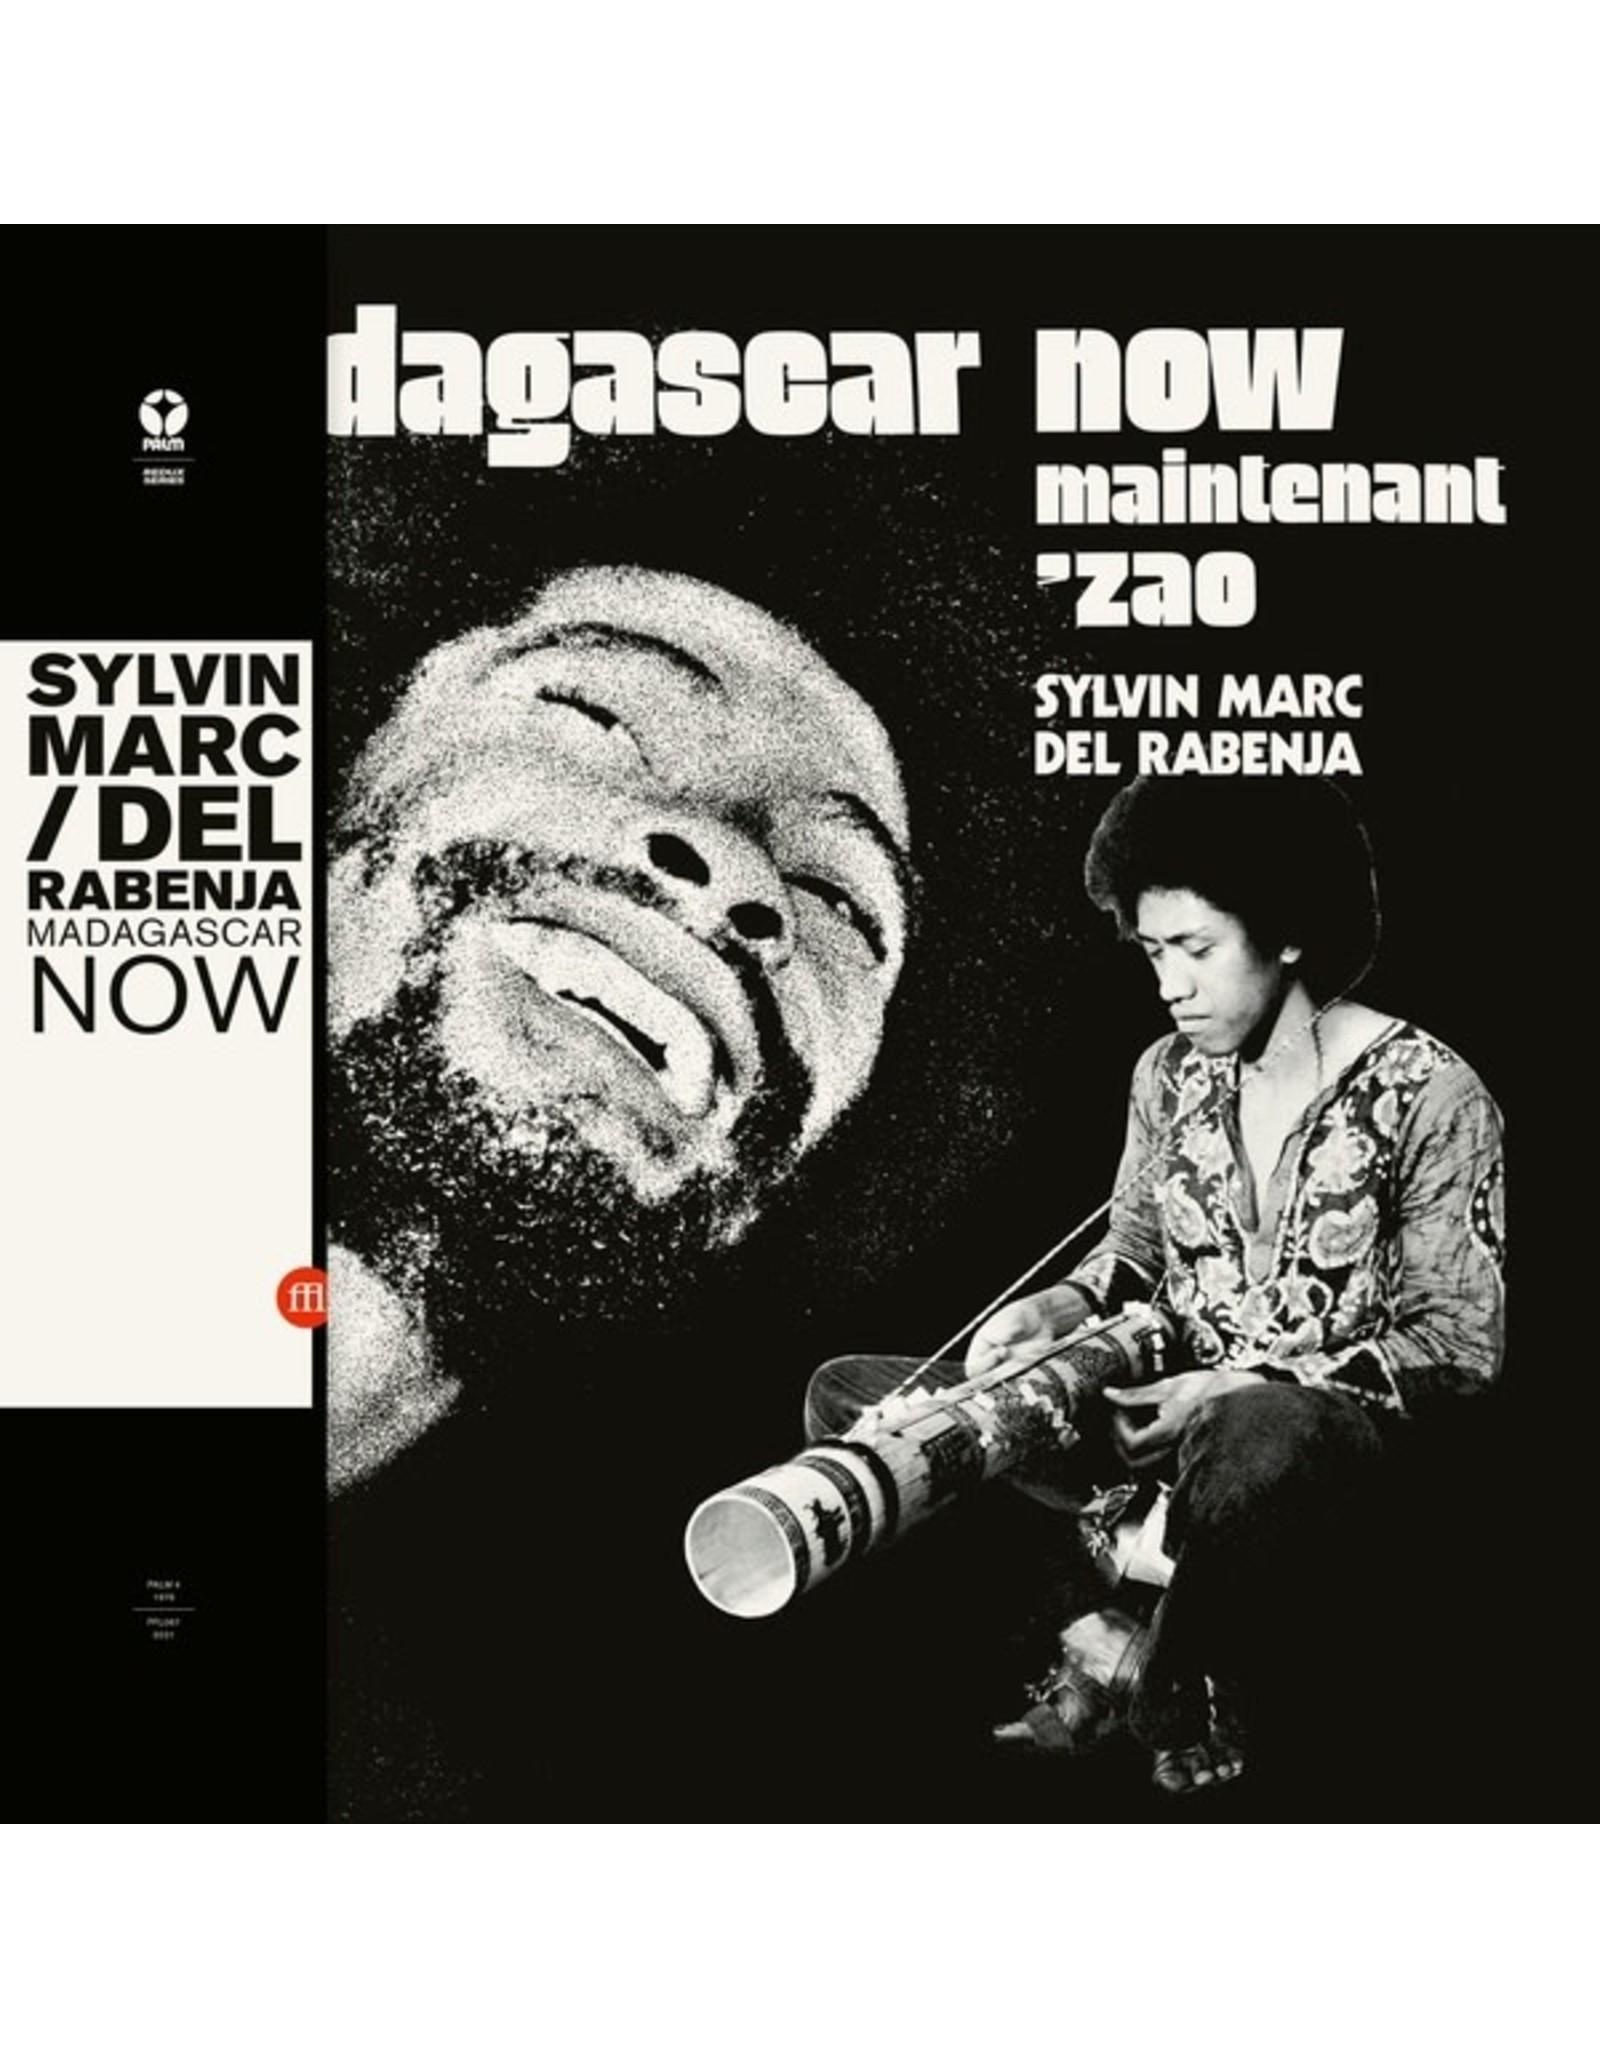 Souffle Continu Marc, Sylvin/del Rabenja: Madagascar Now LP